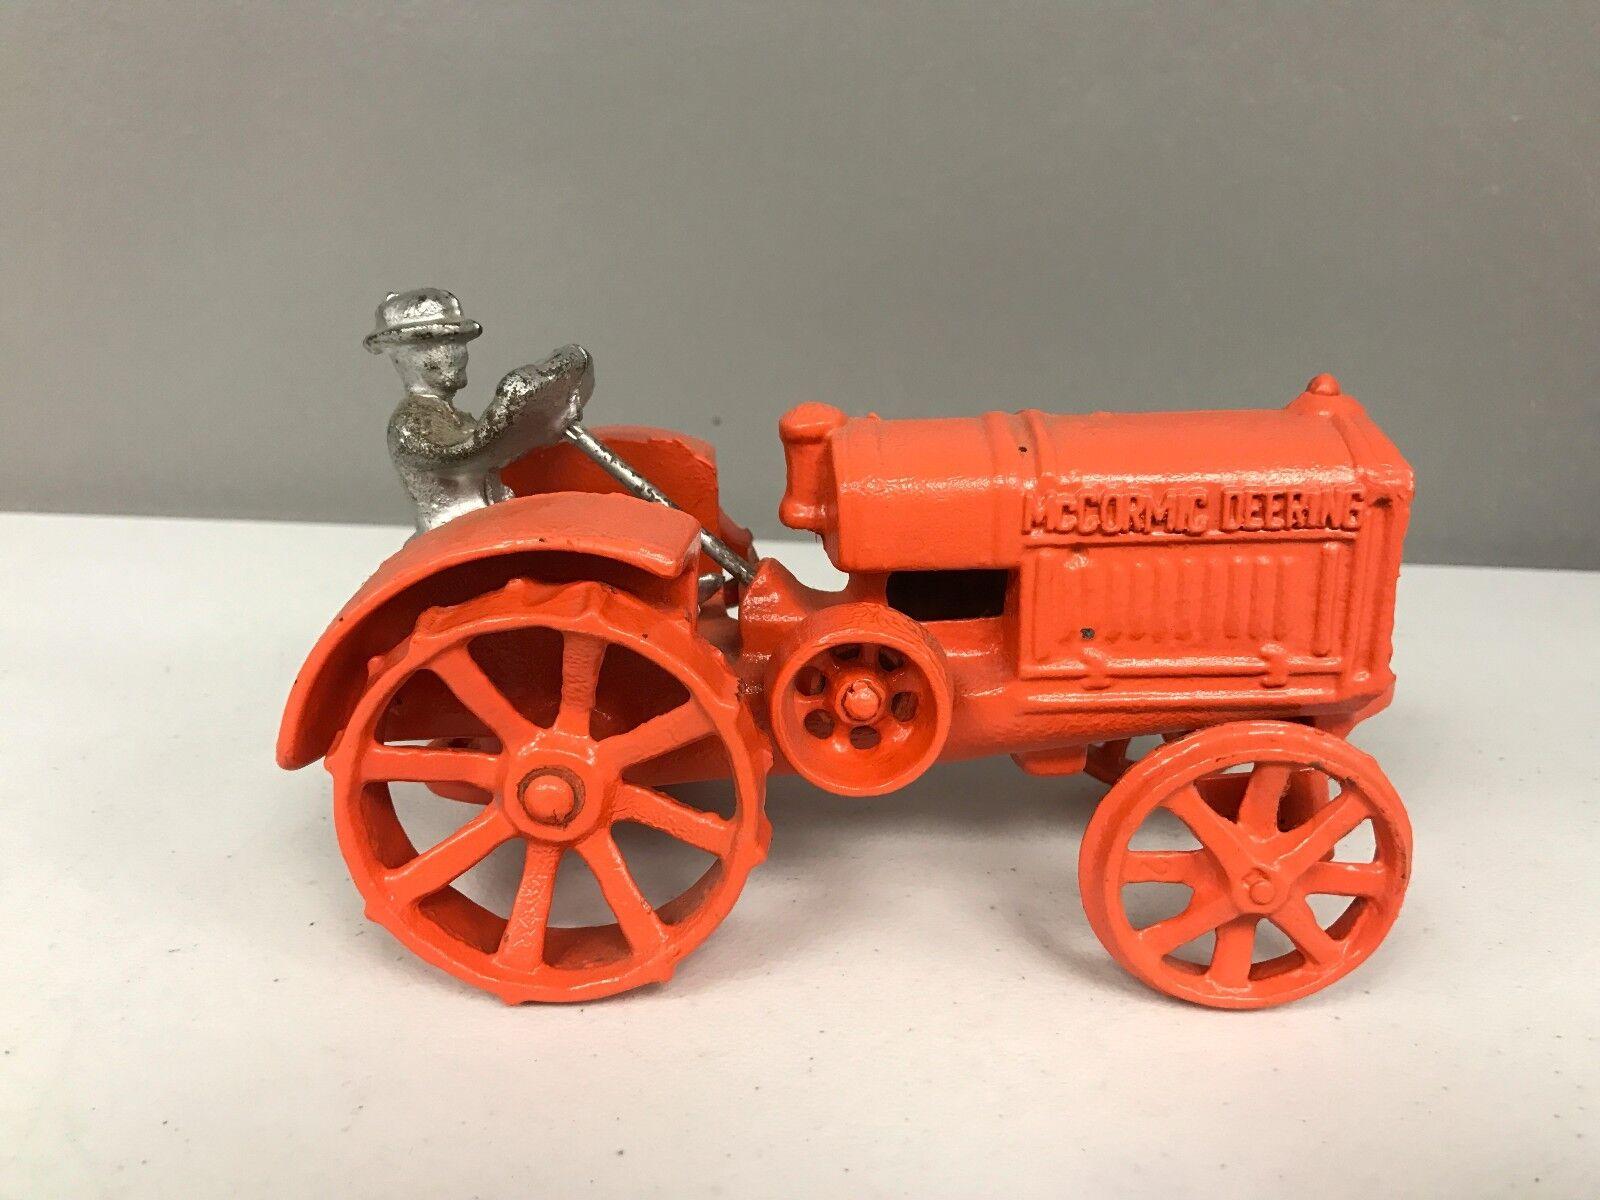 Vintage Cast Iron Toy Farm Tractor